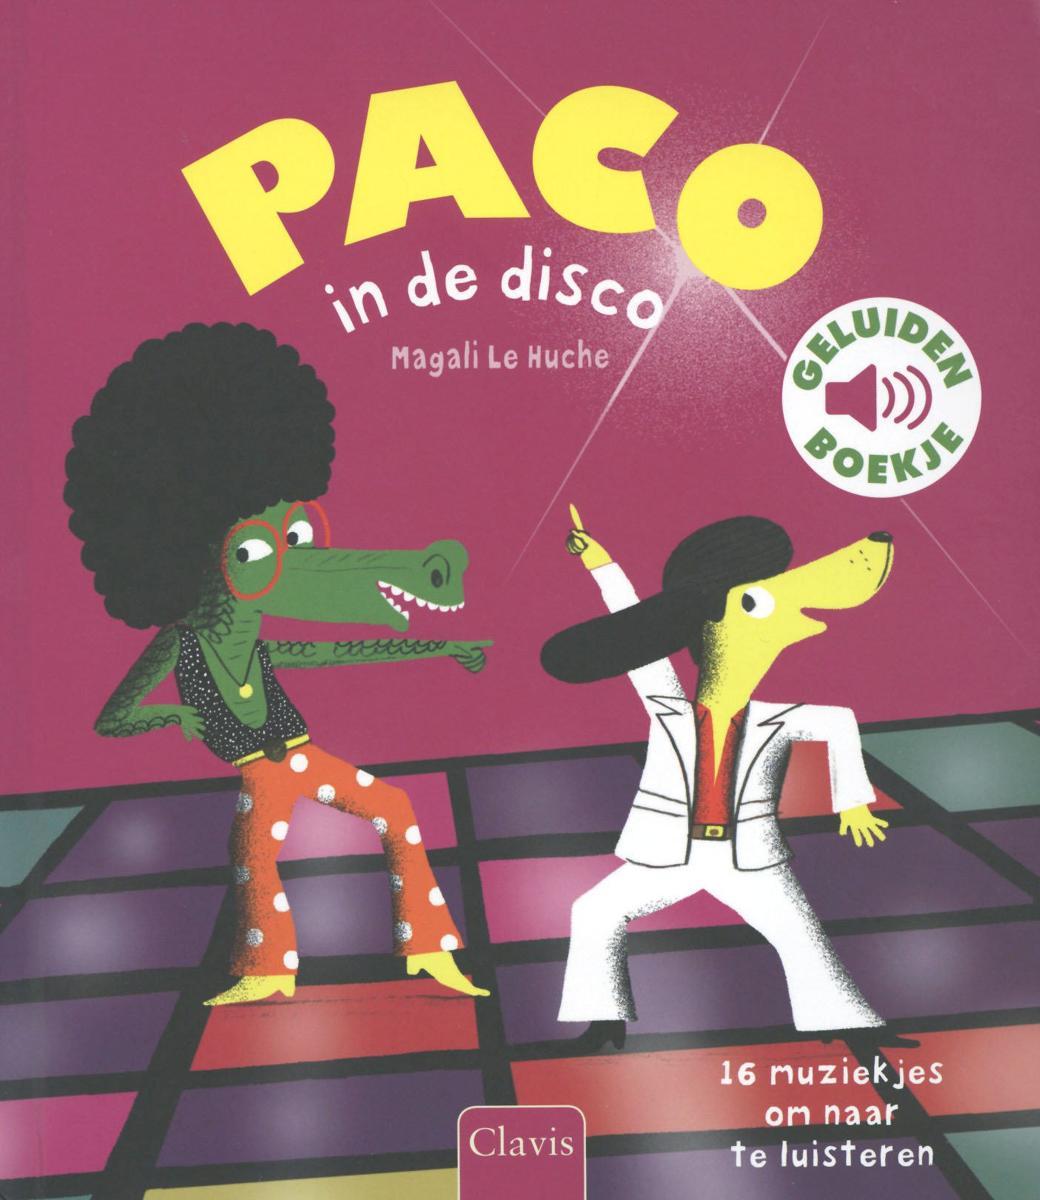 cover van Paco in de disco, boek van Magali le Huche